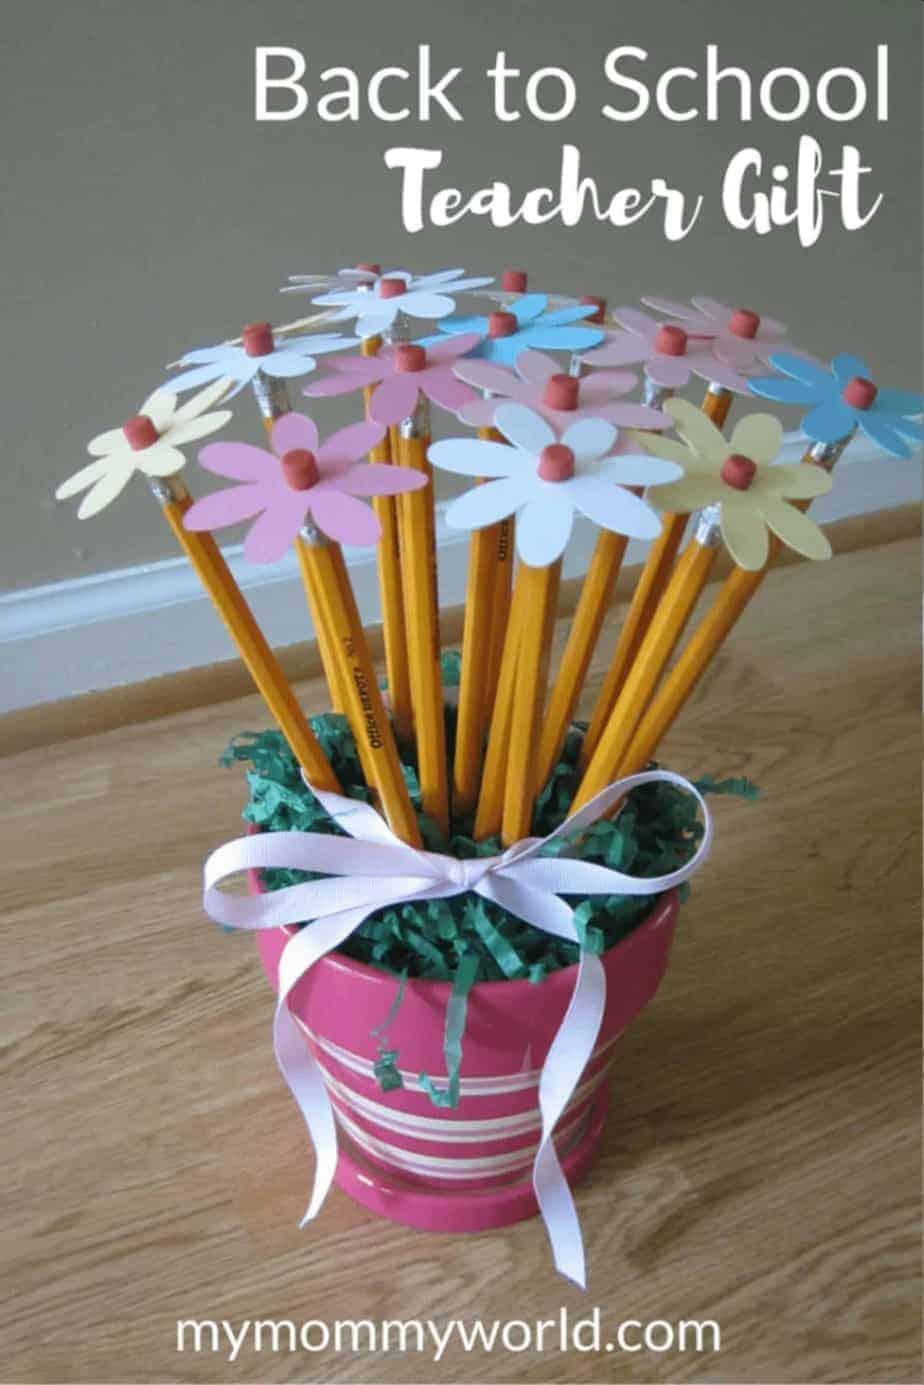 Diy flower vase craft teacher gift idea